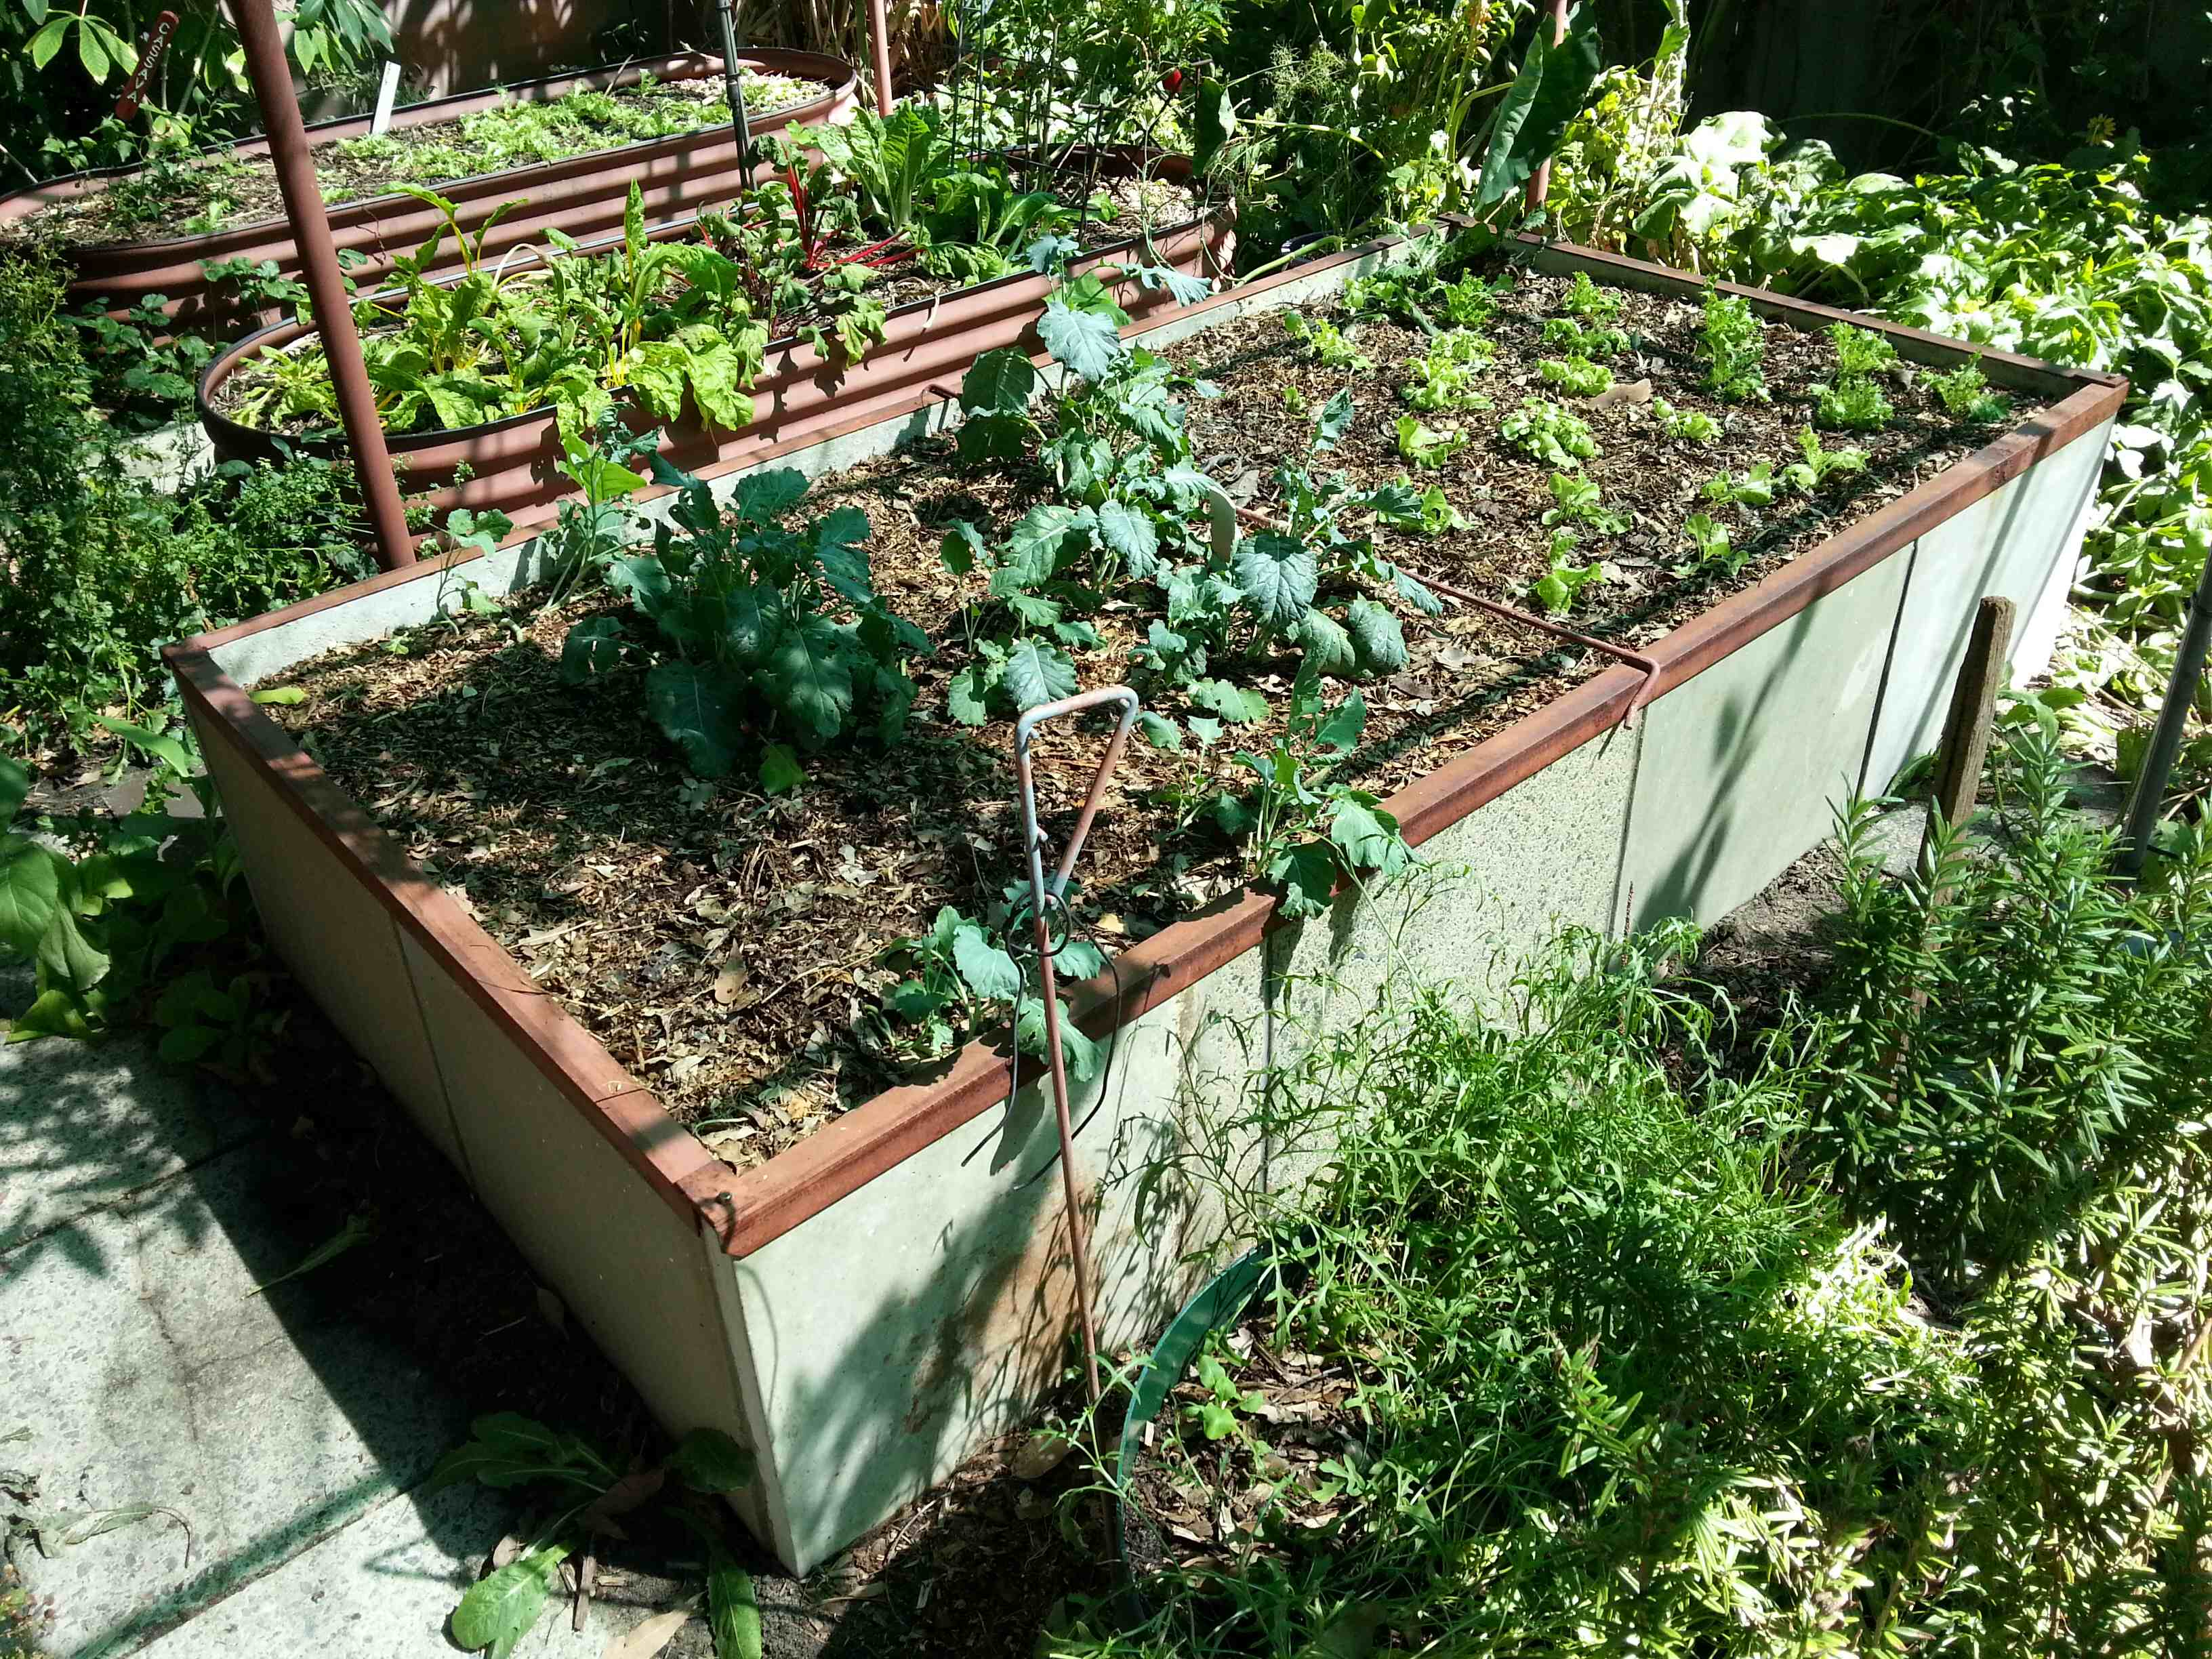 Raised Vegetable Garden Beds On Concrete The Diy Cinder Block Raised Garden Bed Hey Wanderer